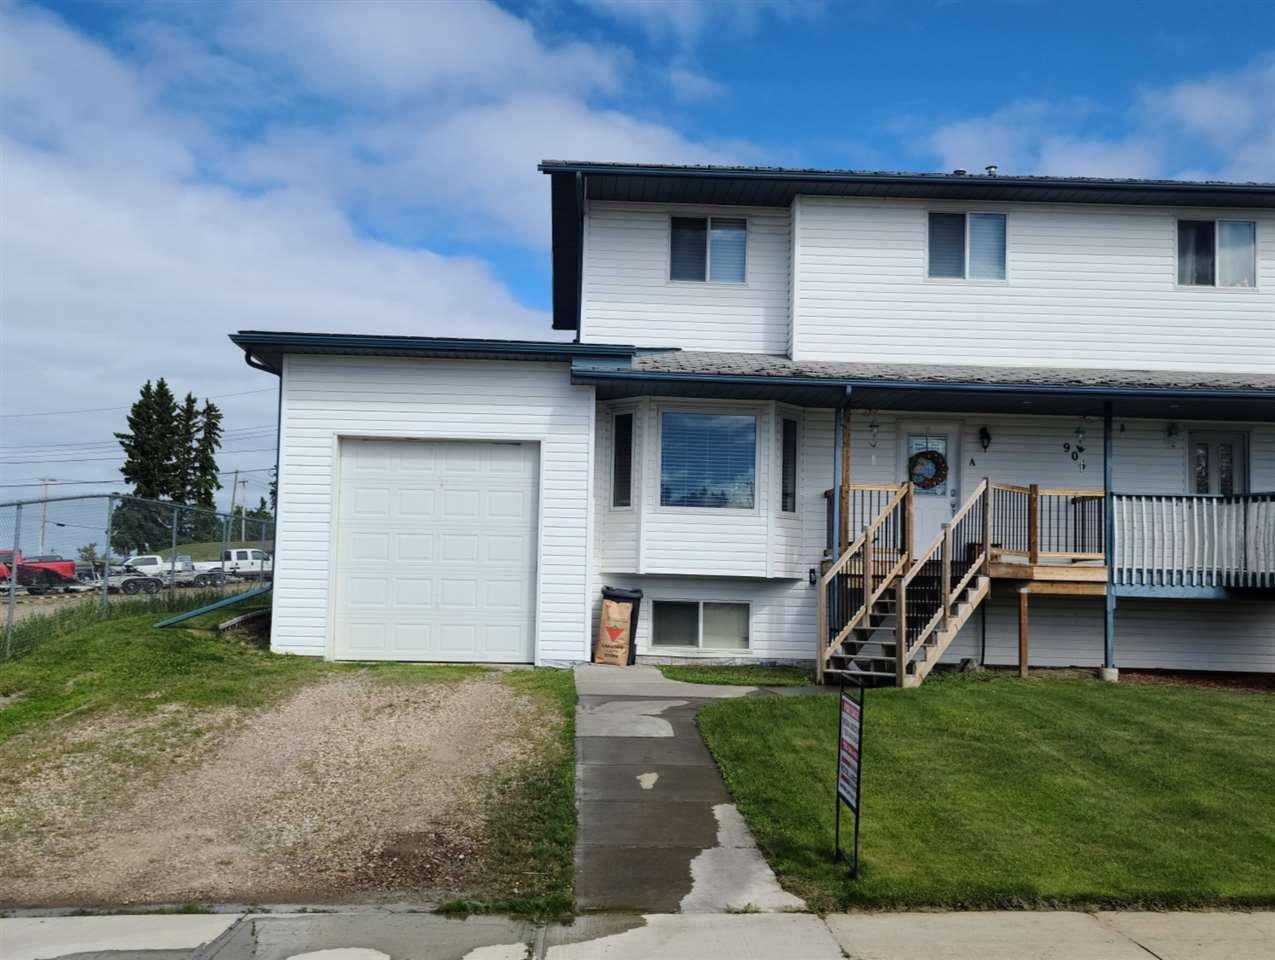 Main Photo: 906A 9 Street: Cold Lake House Half Duplex for sale : MLS®# E4193290